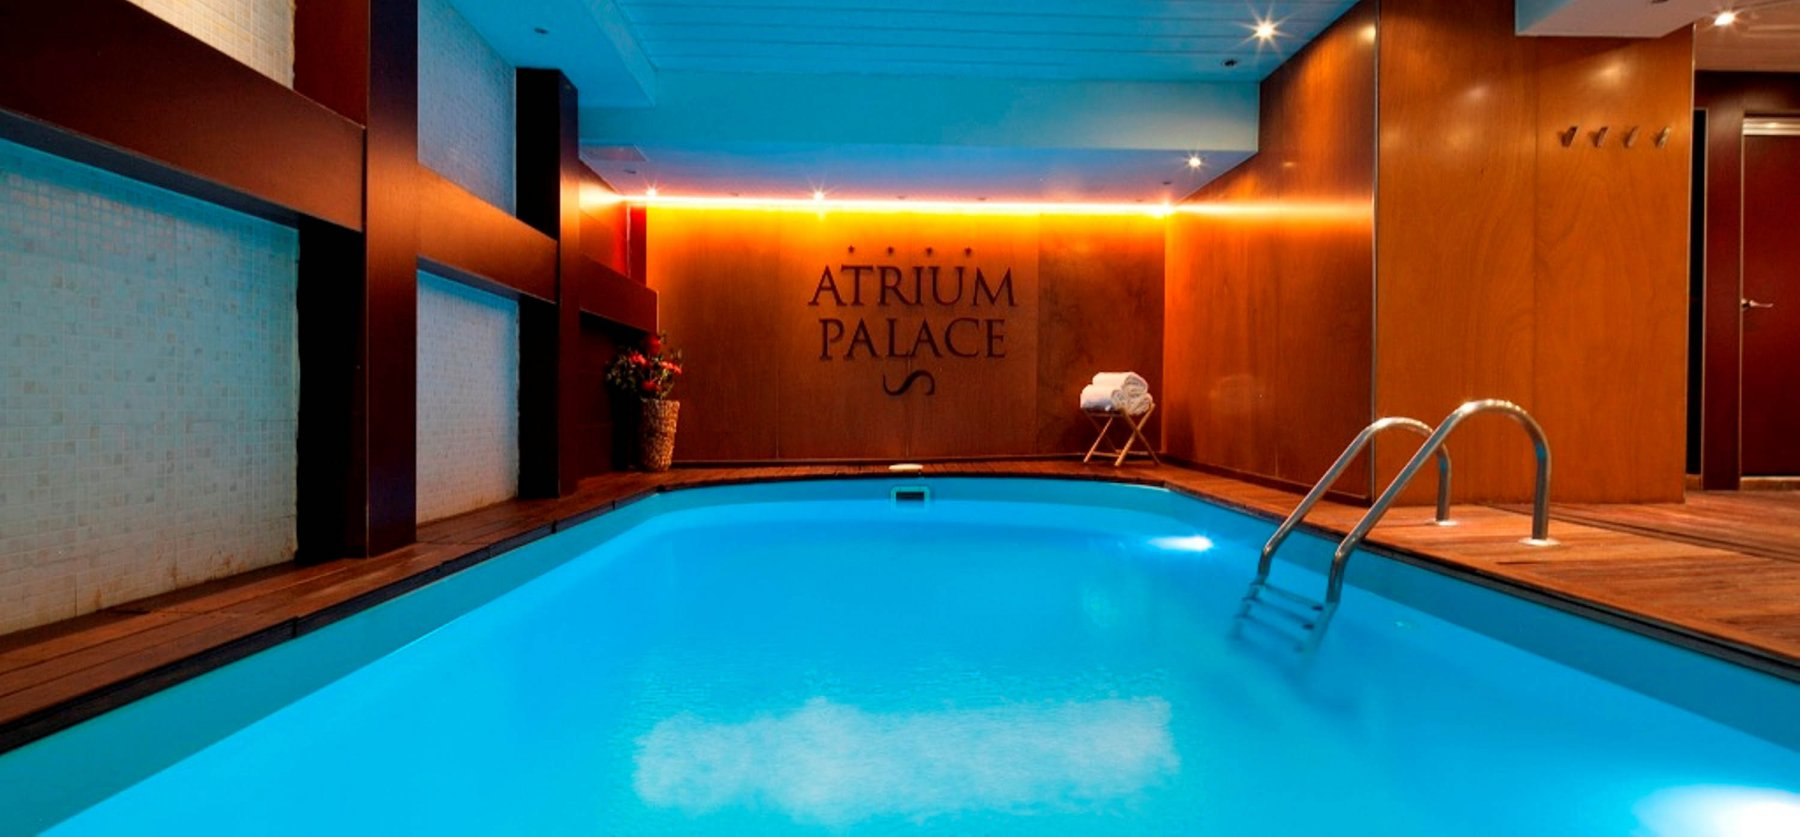 Photos and virtual tour hotel acta atrium palace for Piscina barcelona